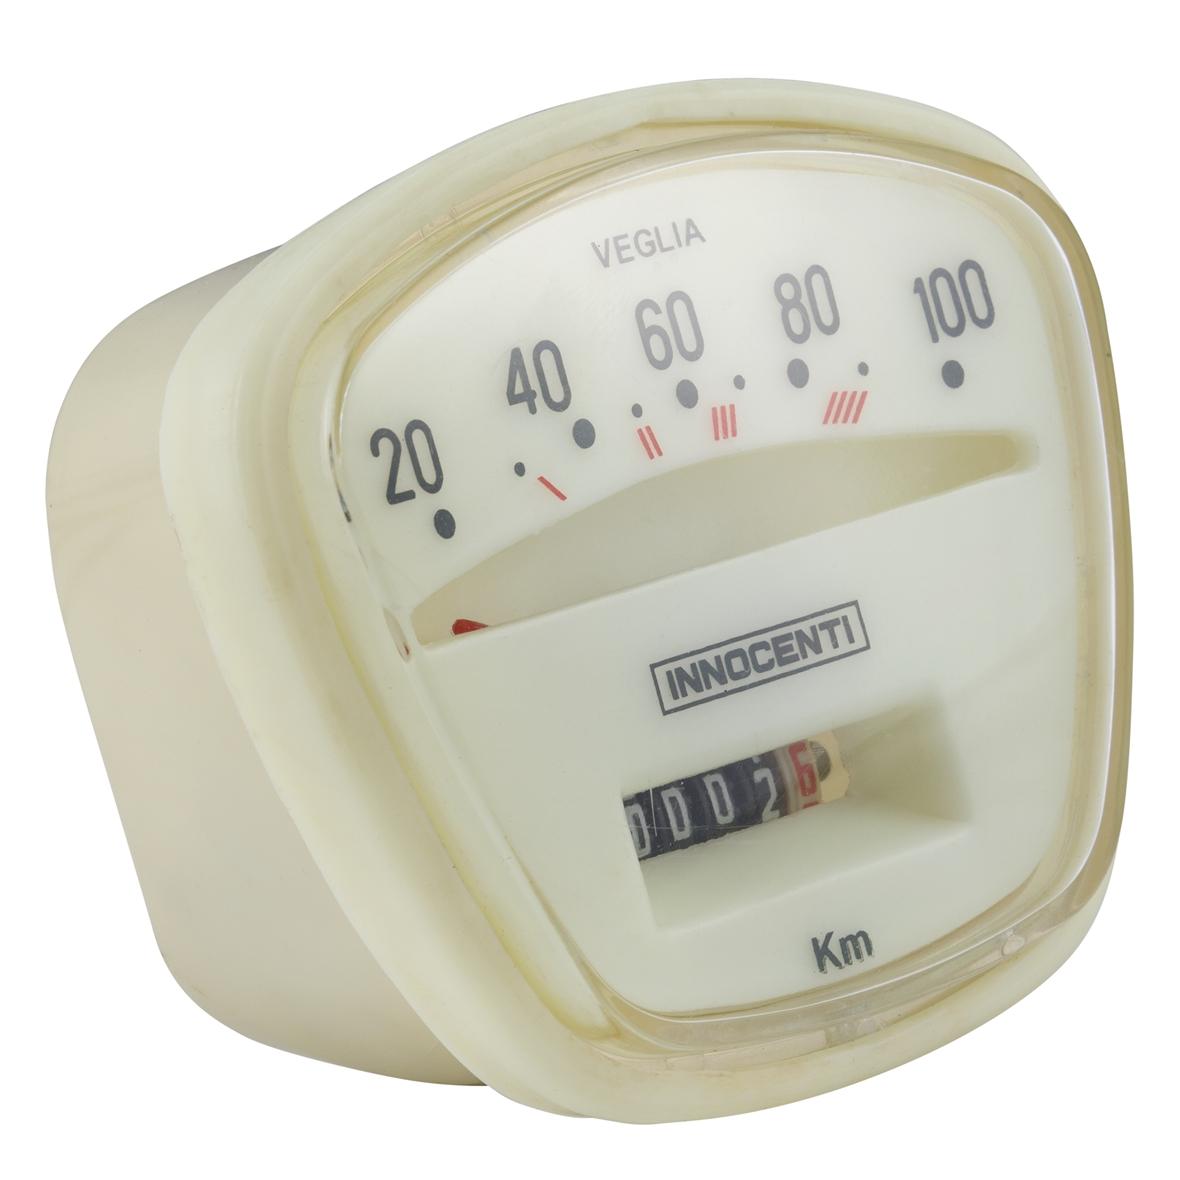 Produktbild für 'Tachometer CASA LAMBRETTA'